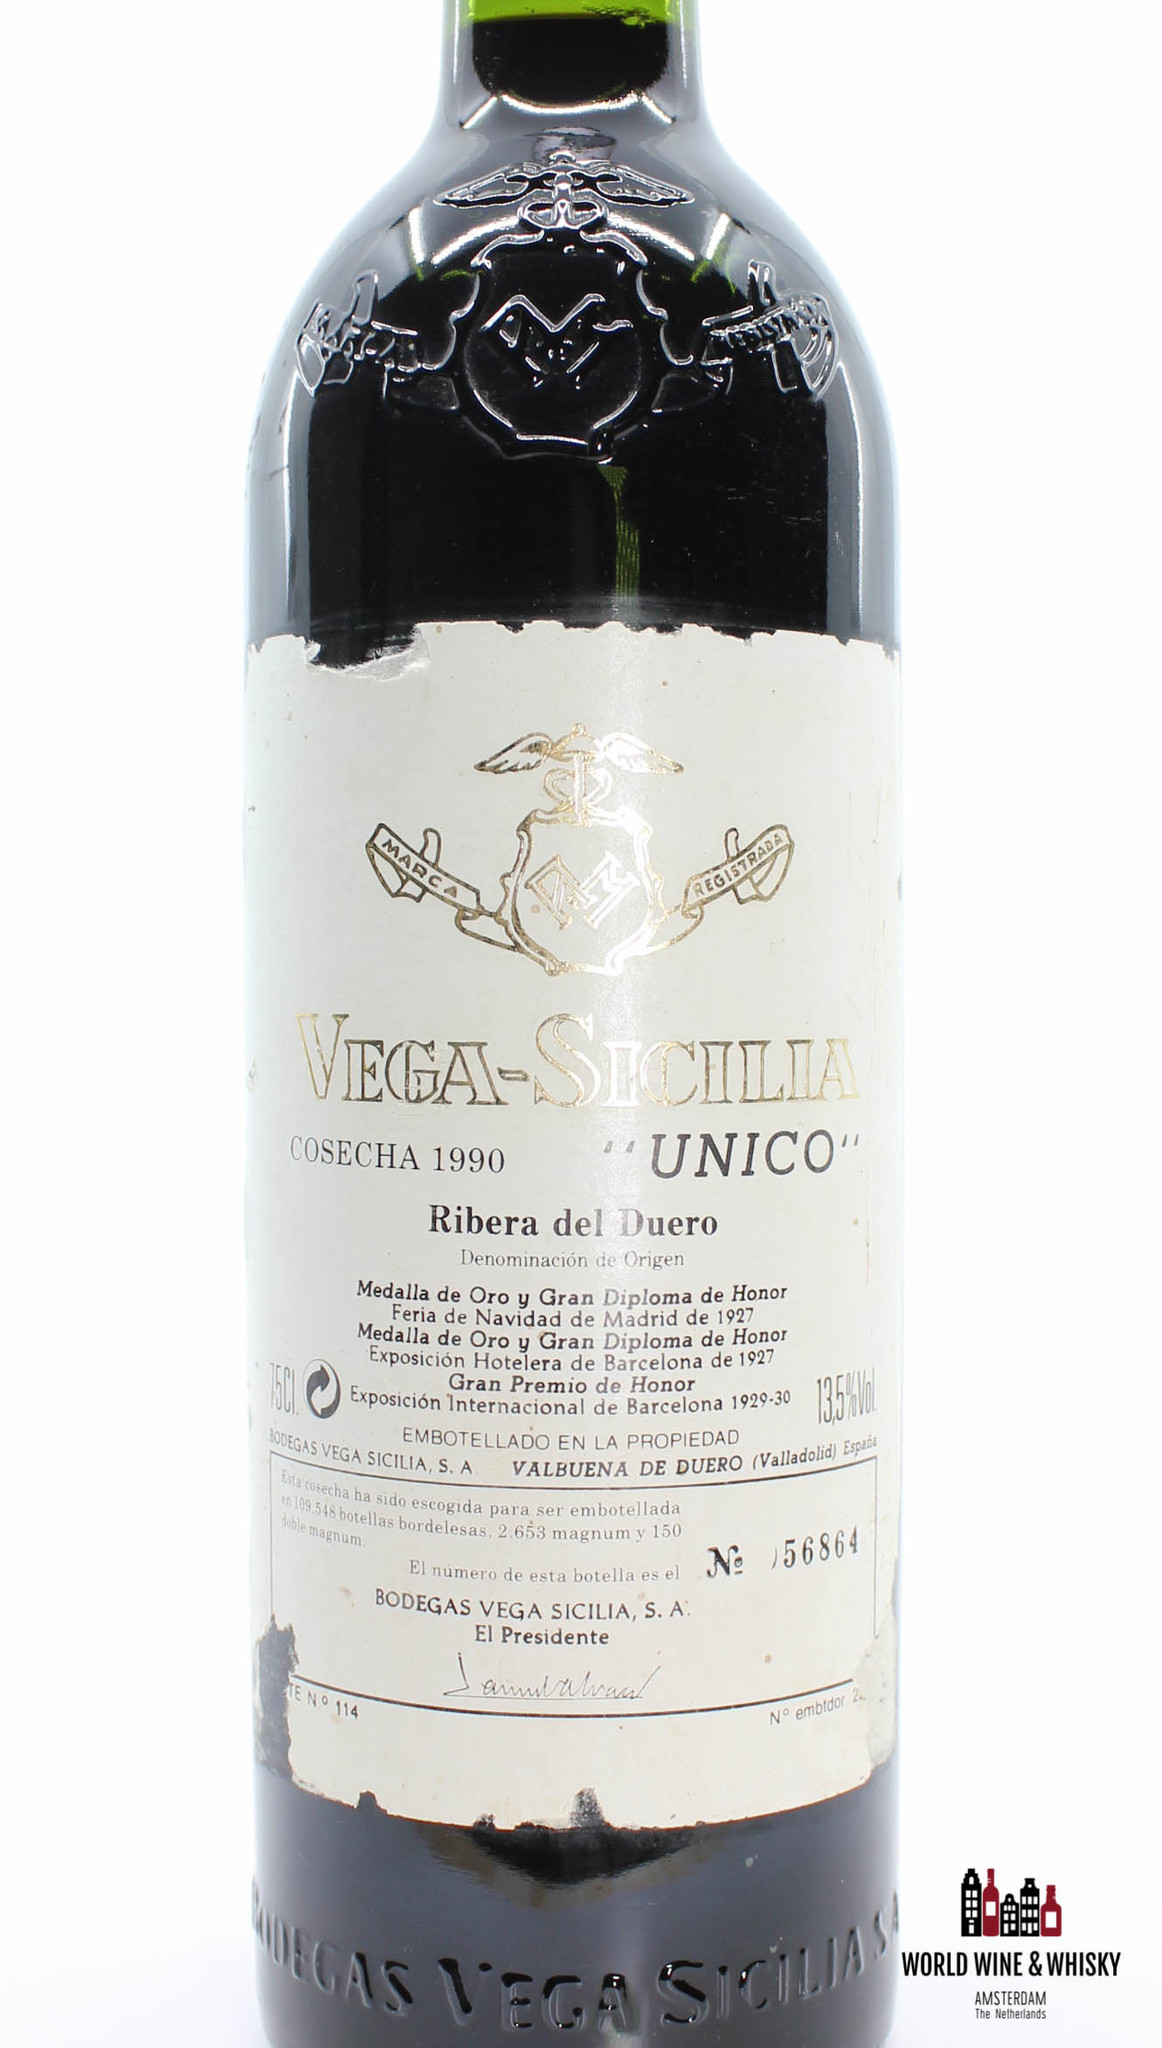 Vega-Sicilia Vega Sicilia Unico - Ribera del Duero 1990